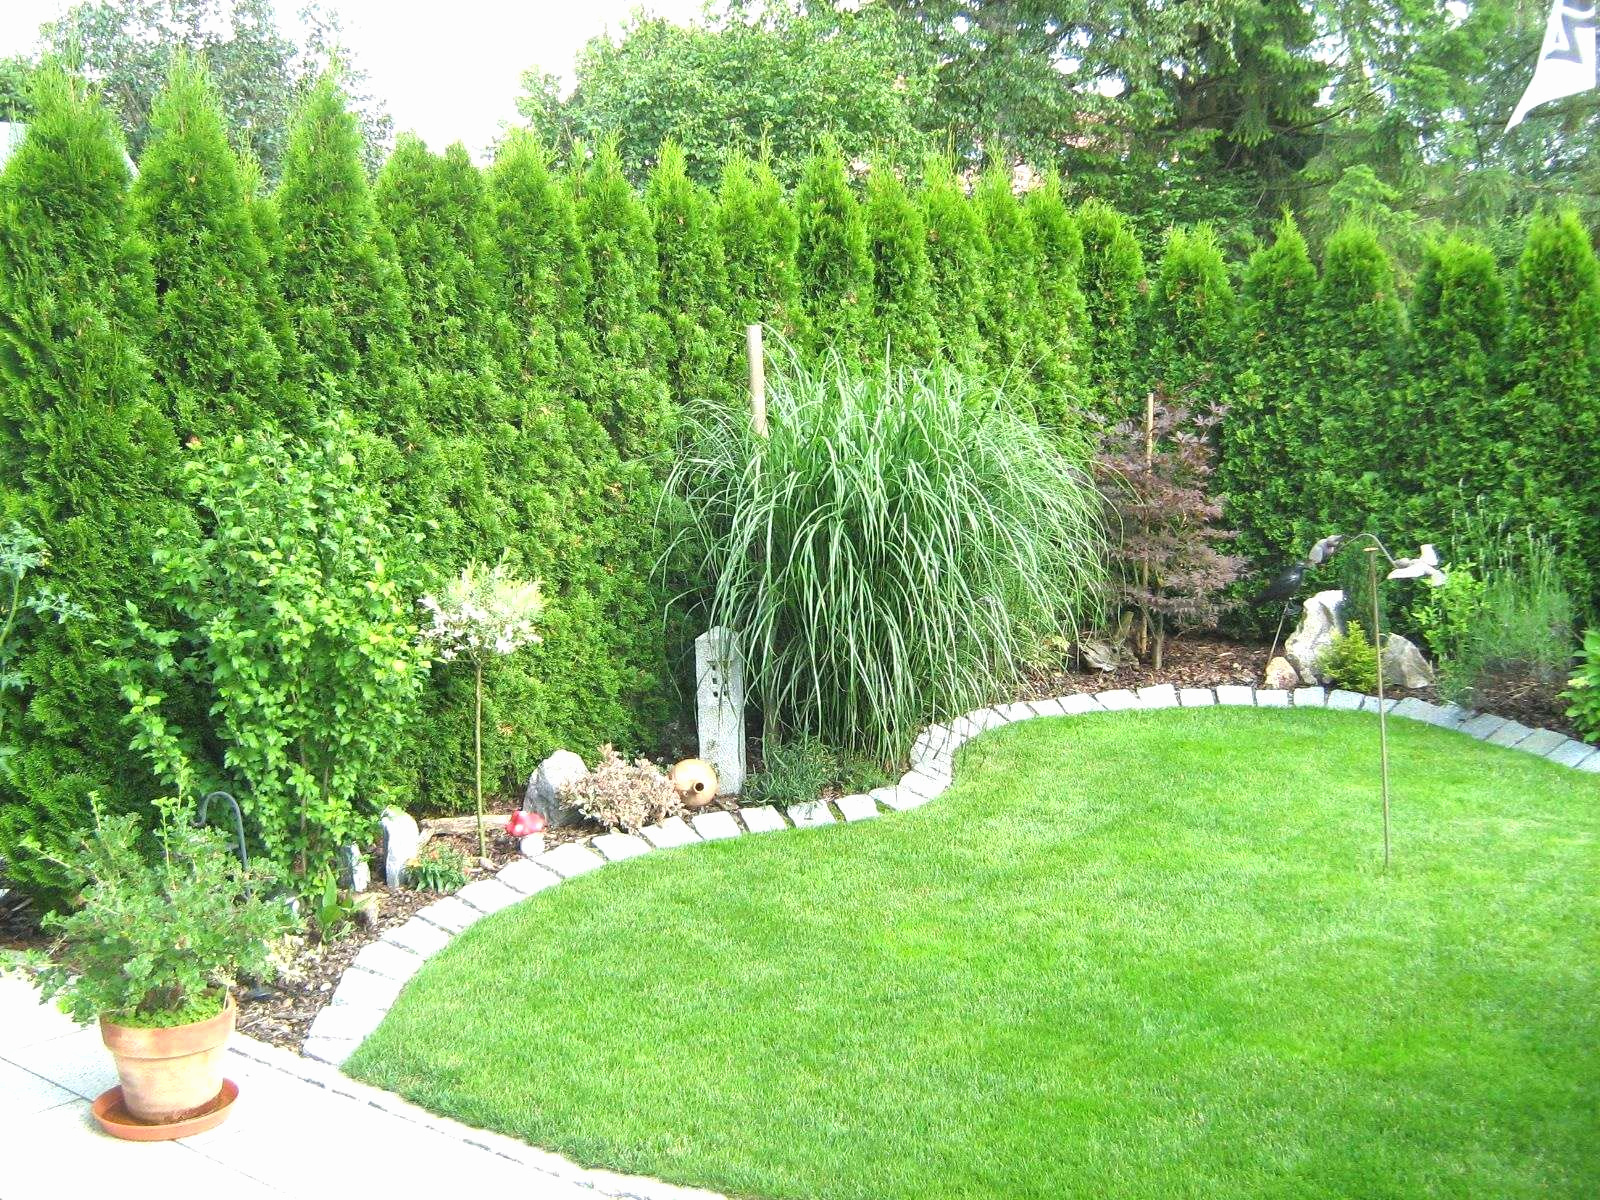 garden hedges beautiful garten tipps genial einen garten anlegen ehrfurchtig garten of garden hedges